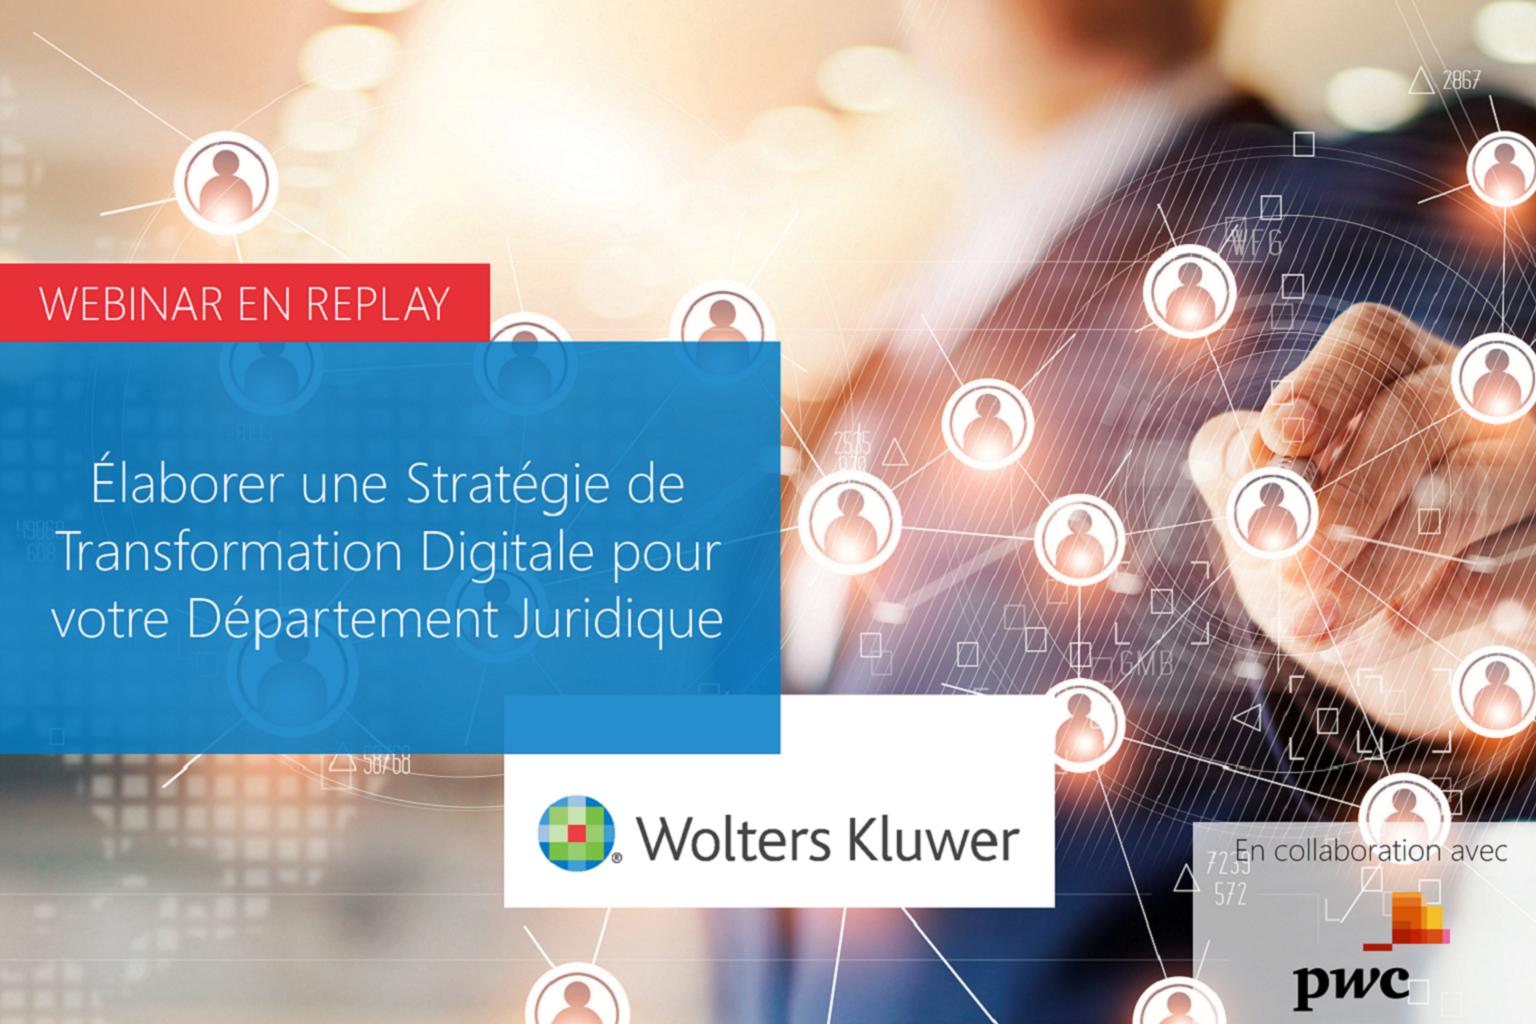 Screenshot-fr-webinar-elaborer-une-strategie-ondemand